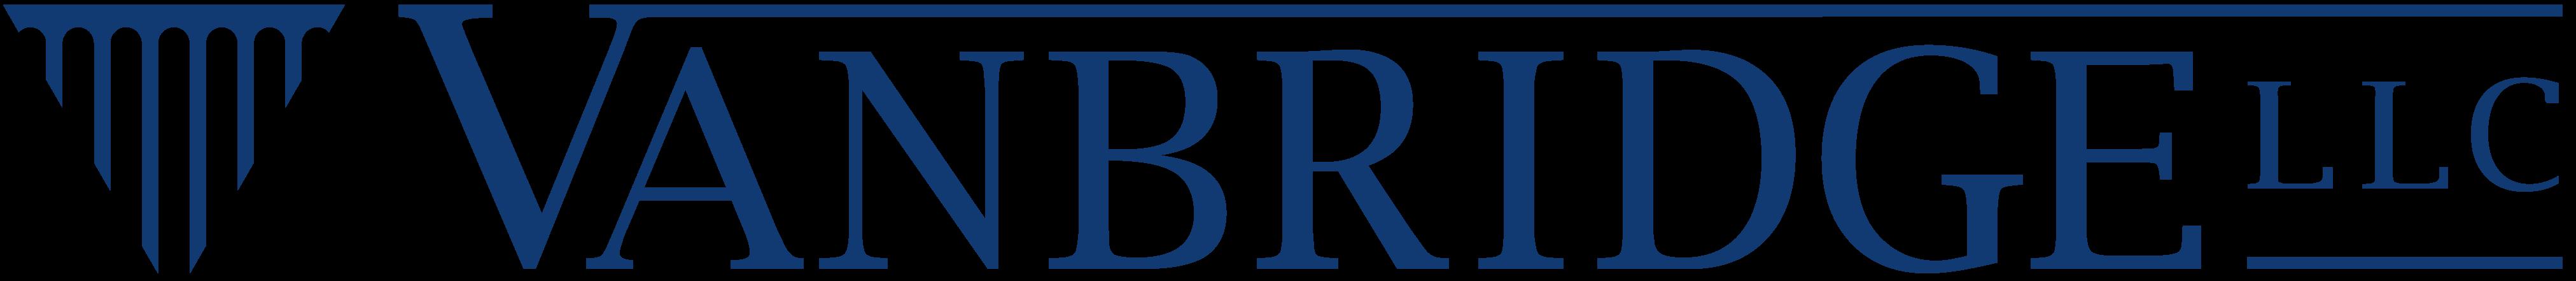 Vanbridge logo